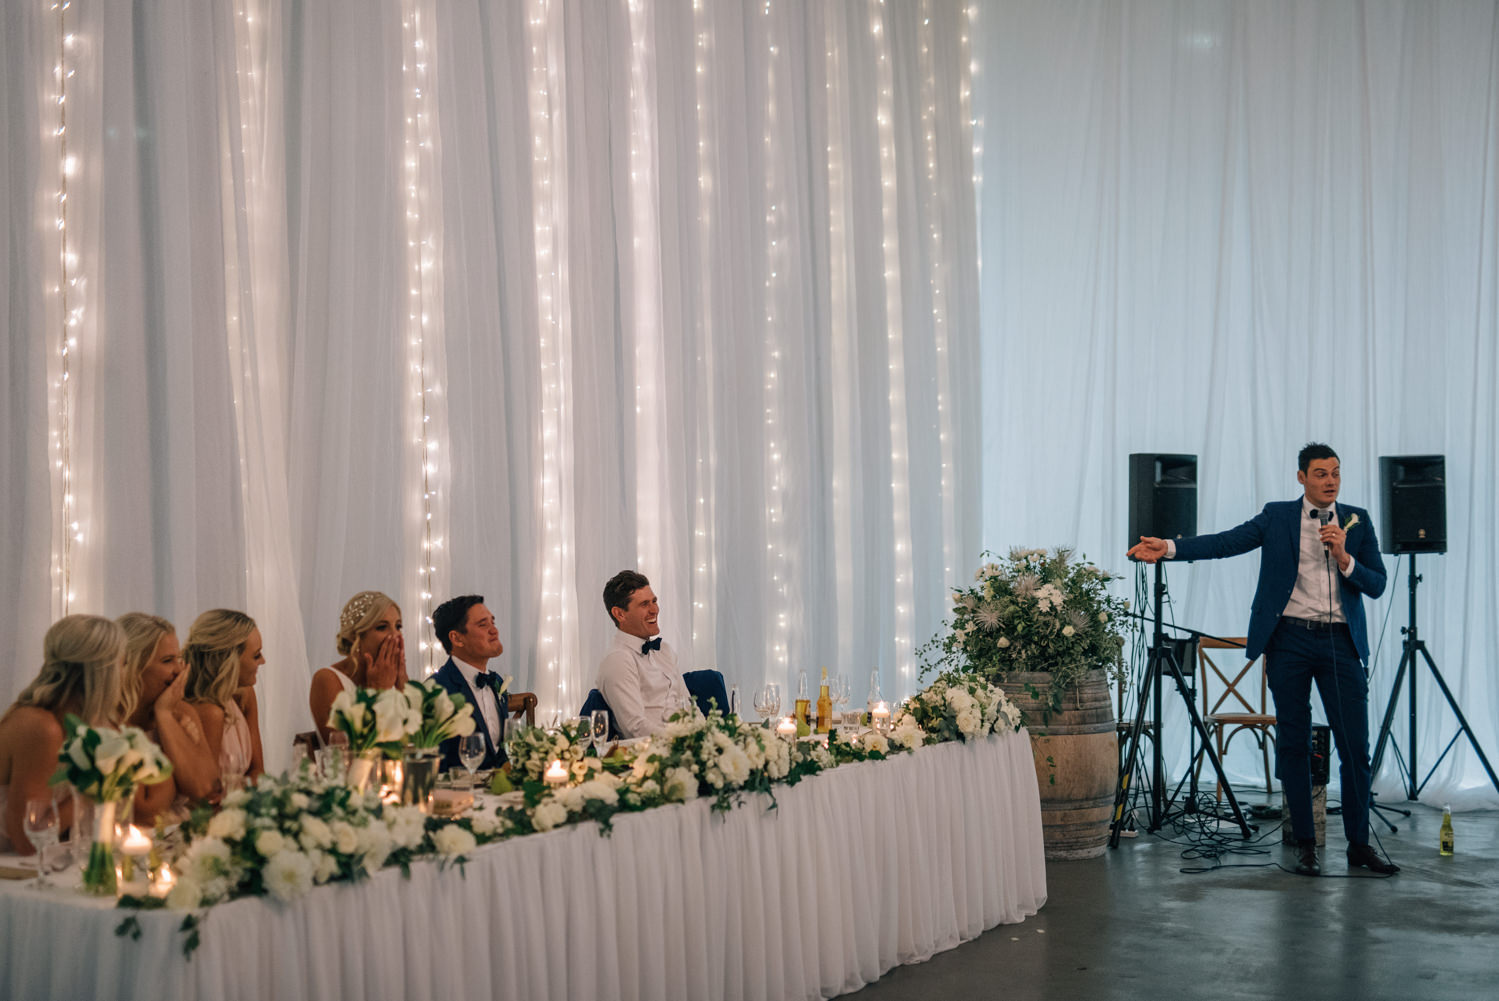 Entally-House-Wedding-Photographer-102.jpg